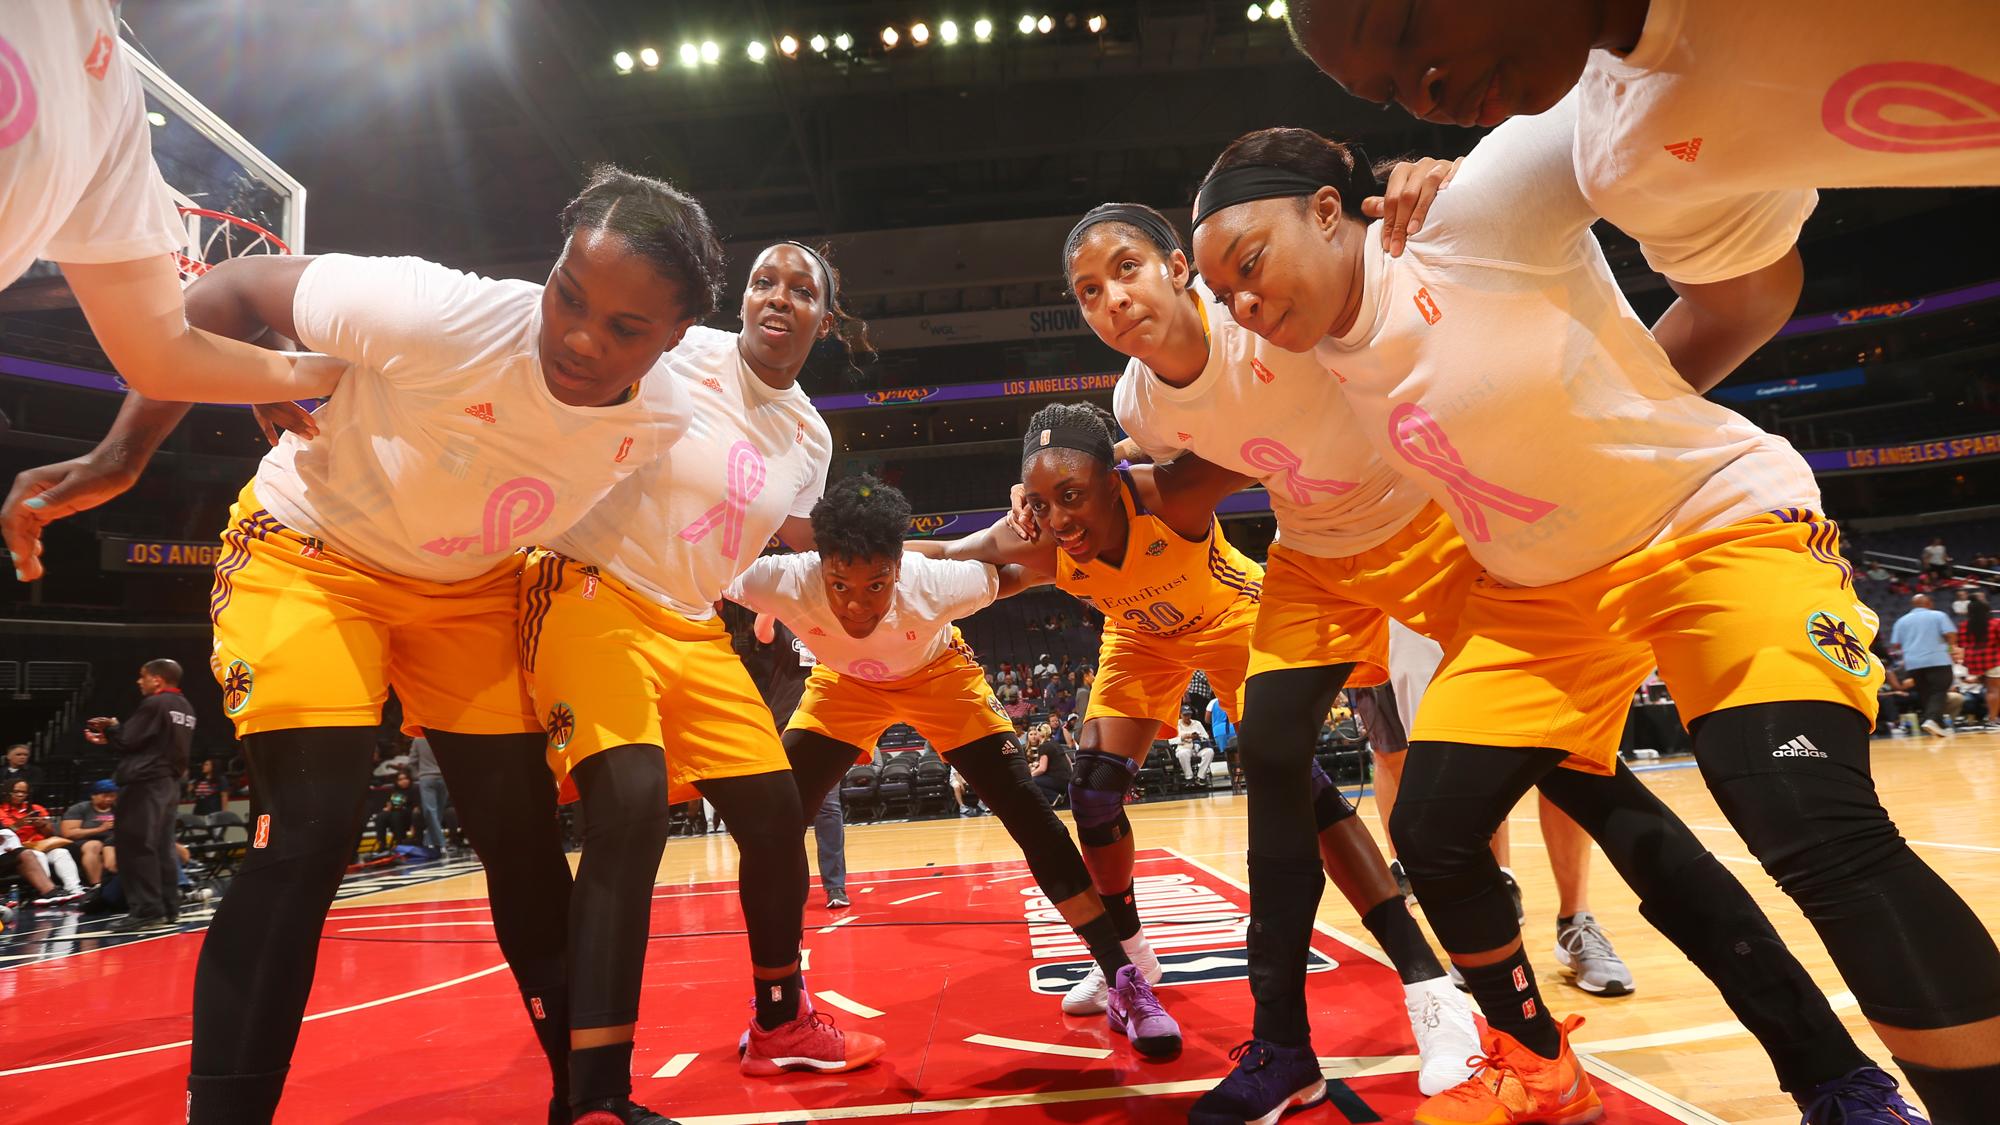 Los Angeles Sparks v Washington Mystics